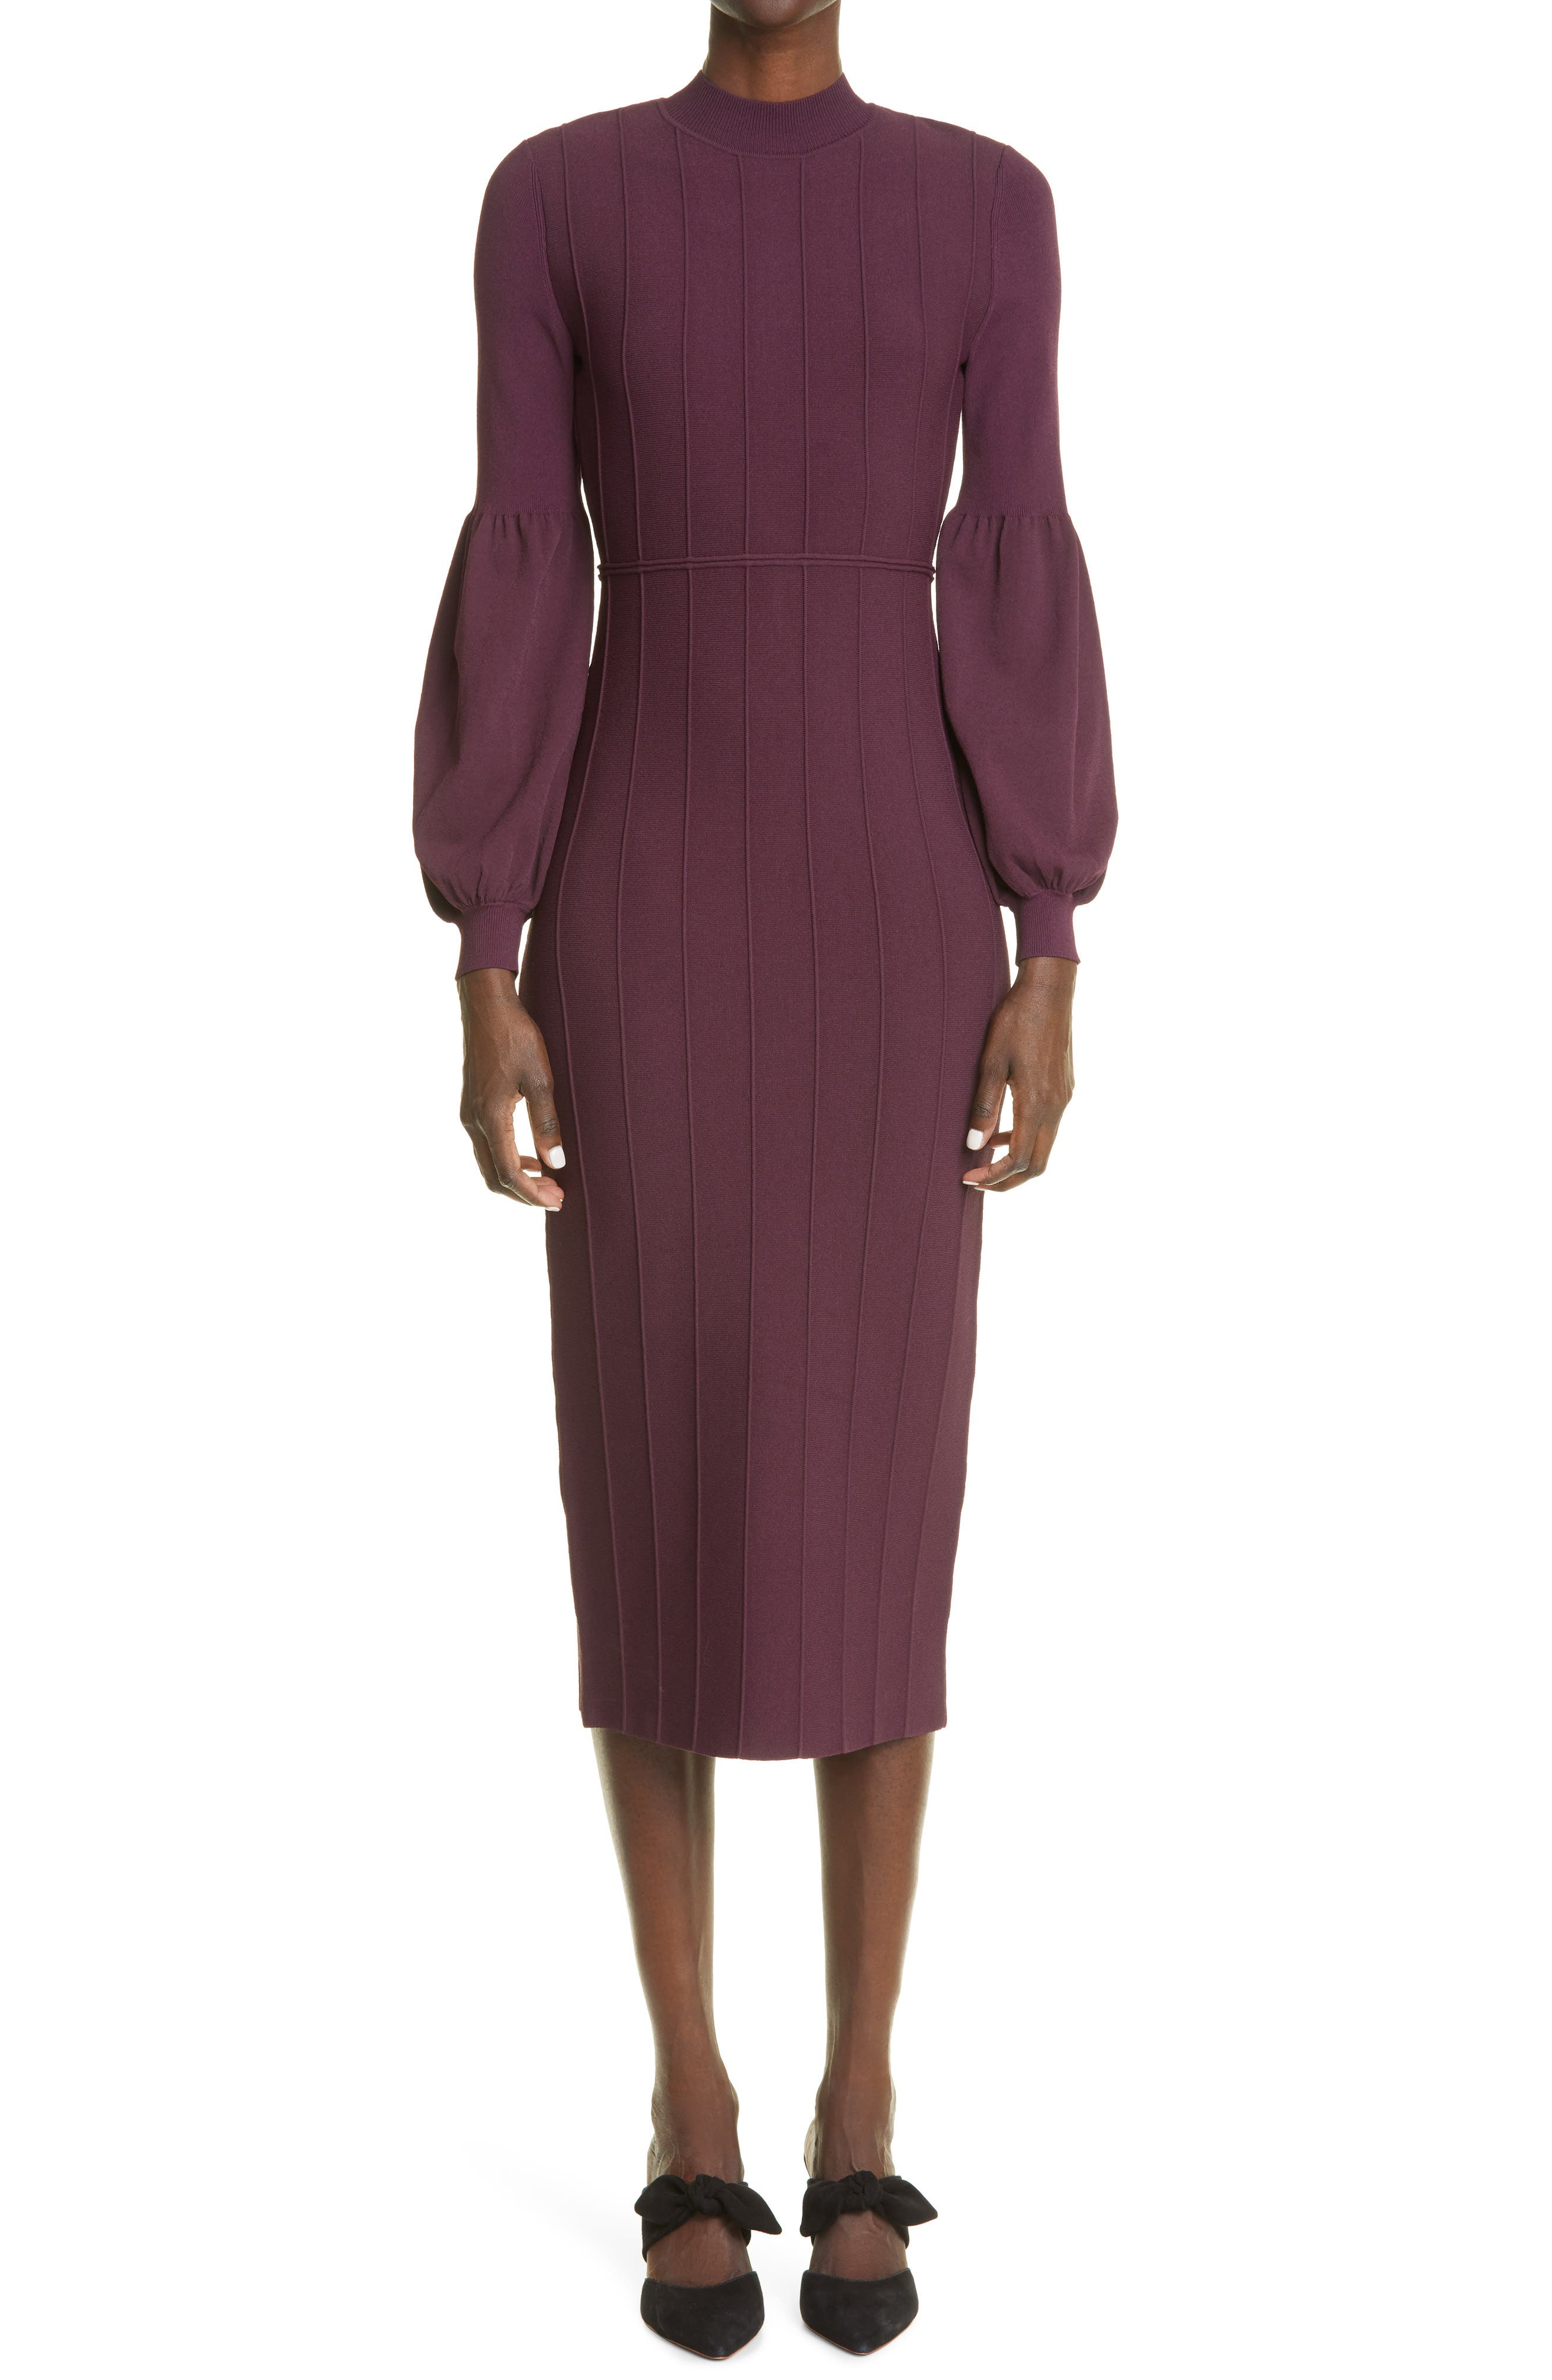 Long Puff Sleeve Knit Dress